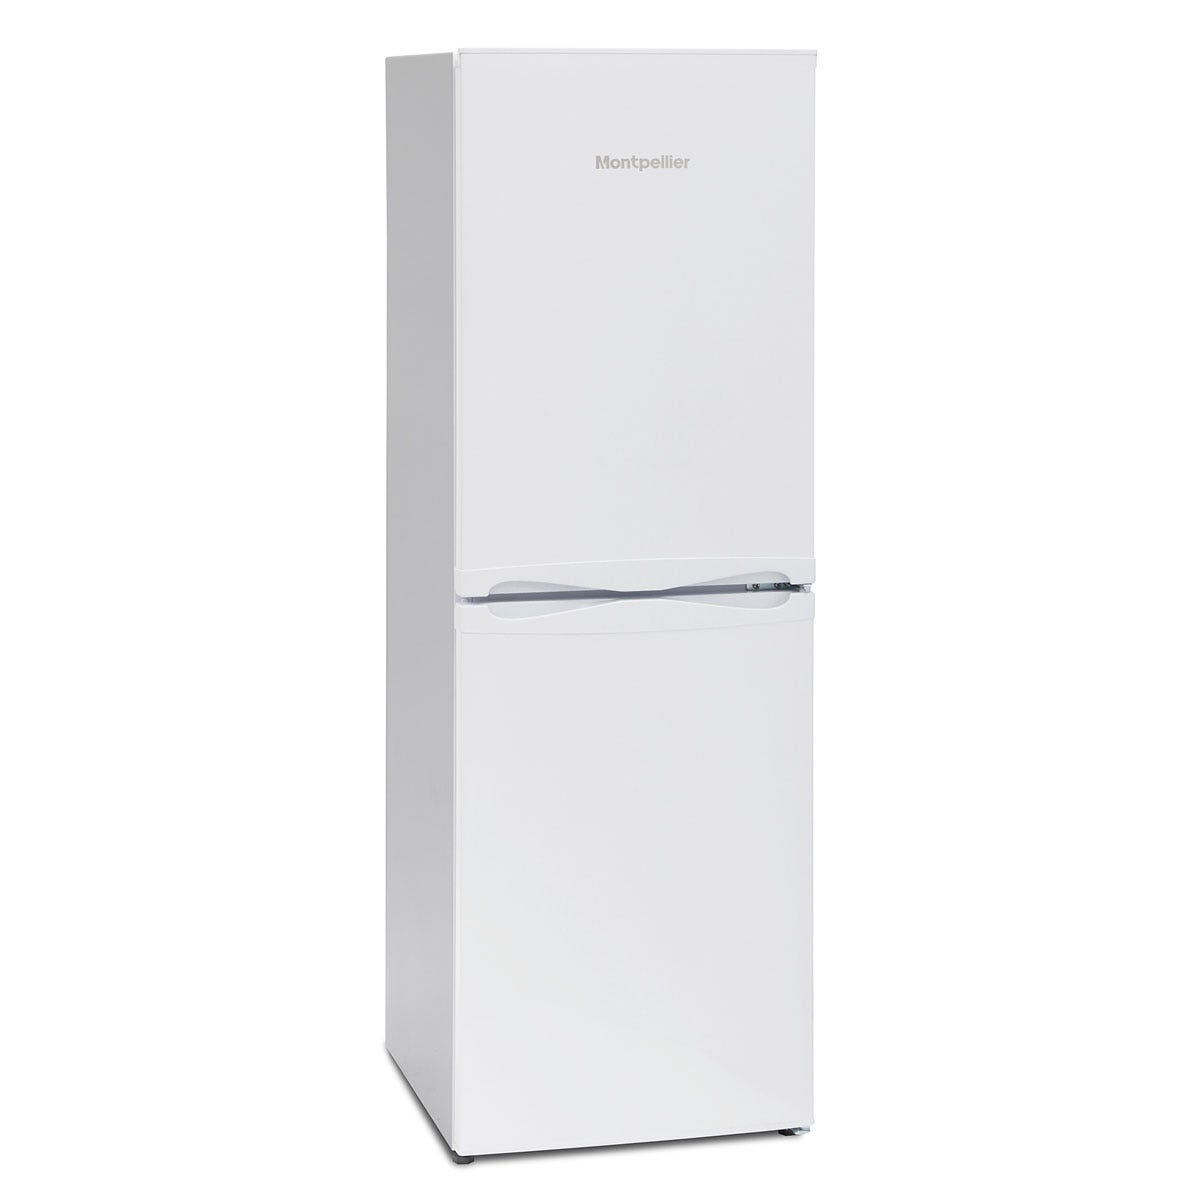 Montpellier MFF145W 48cm Frost Free Fridge Freezer - White